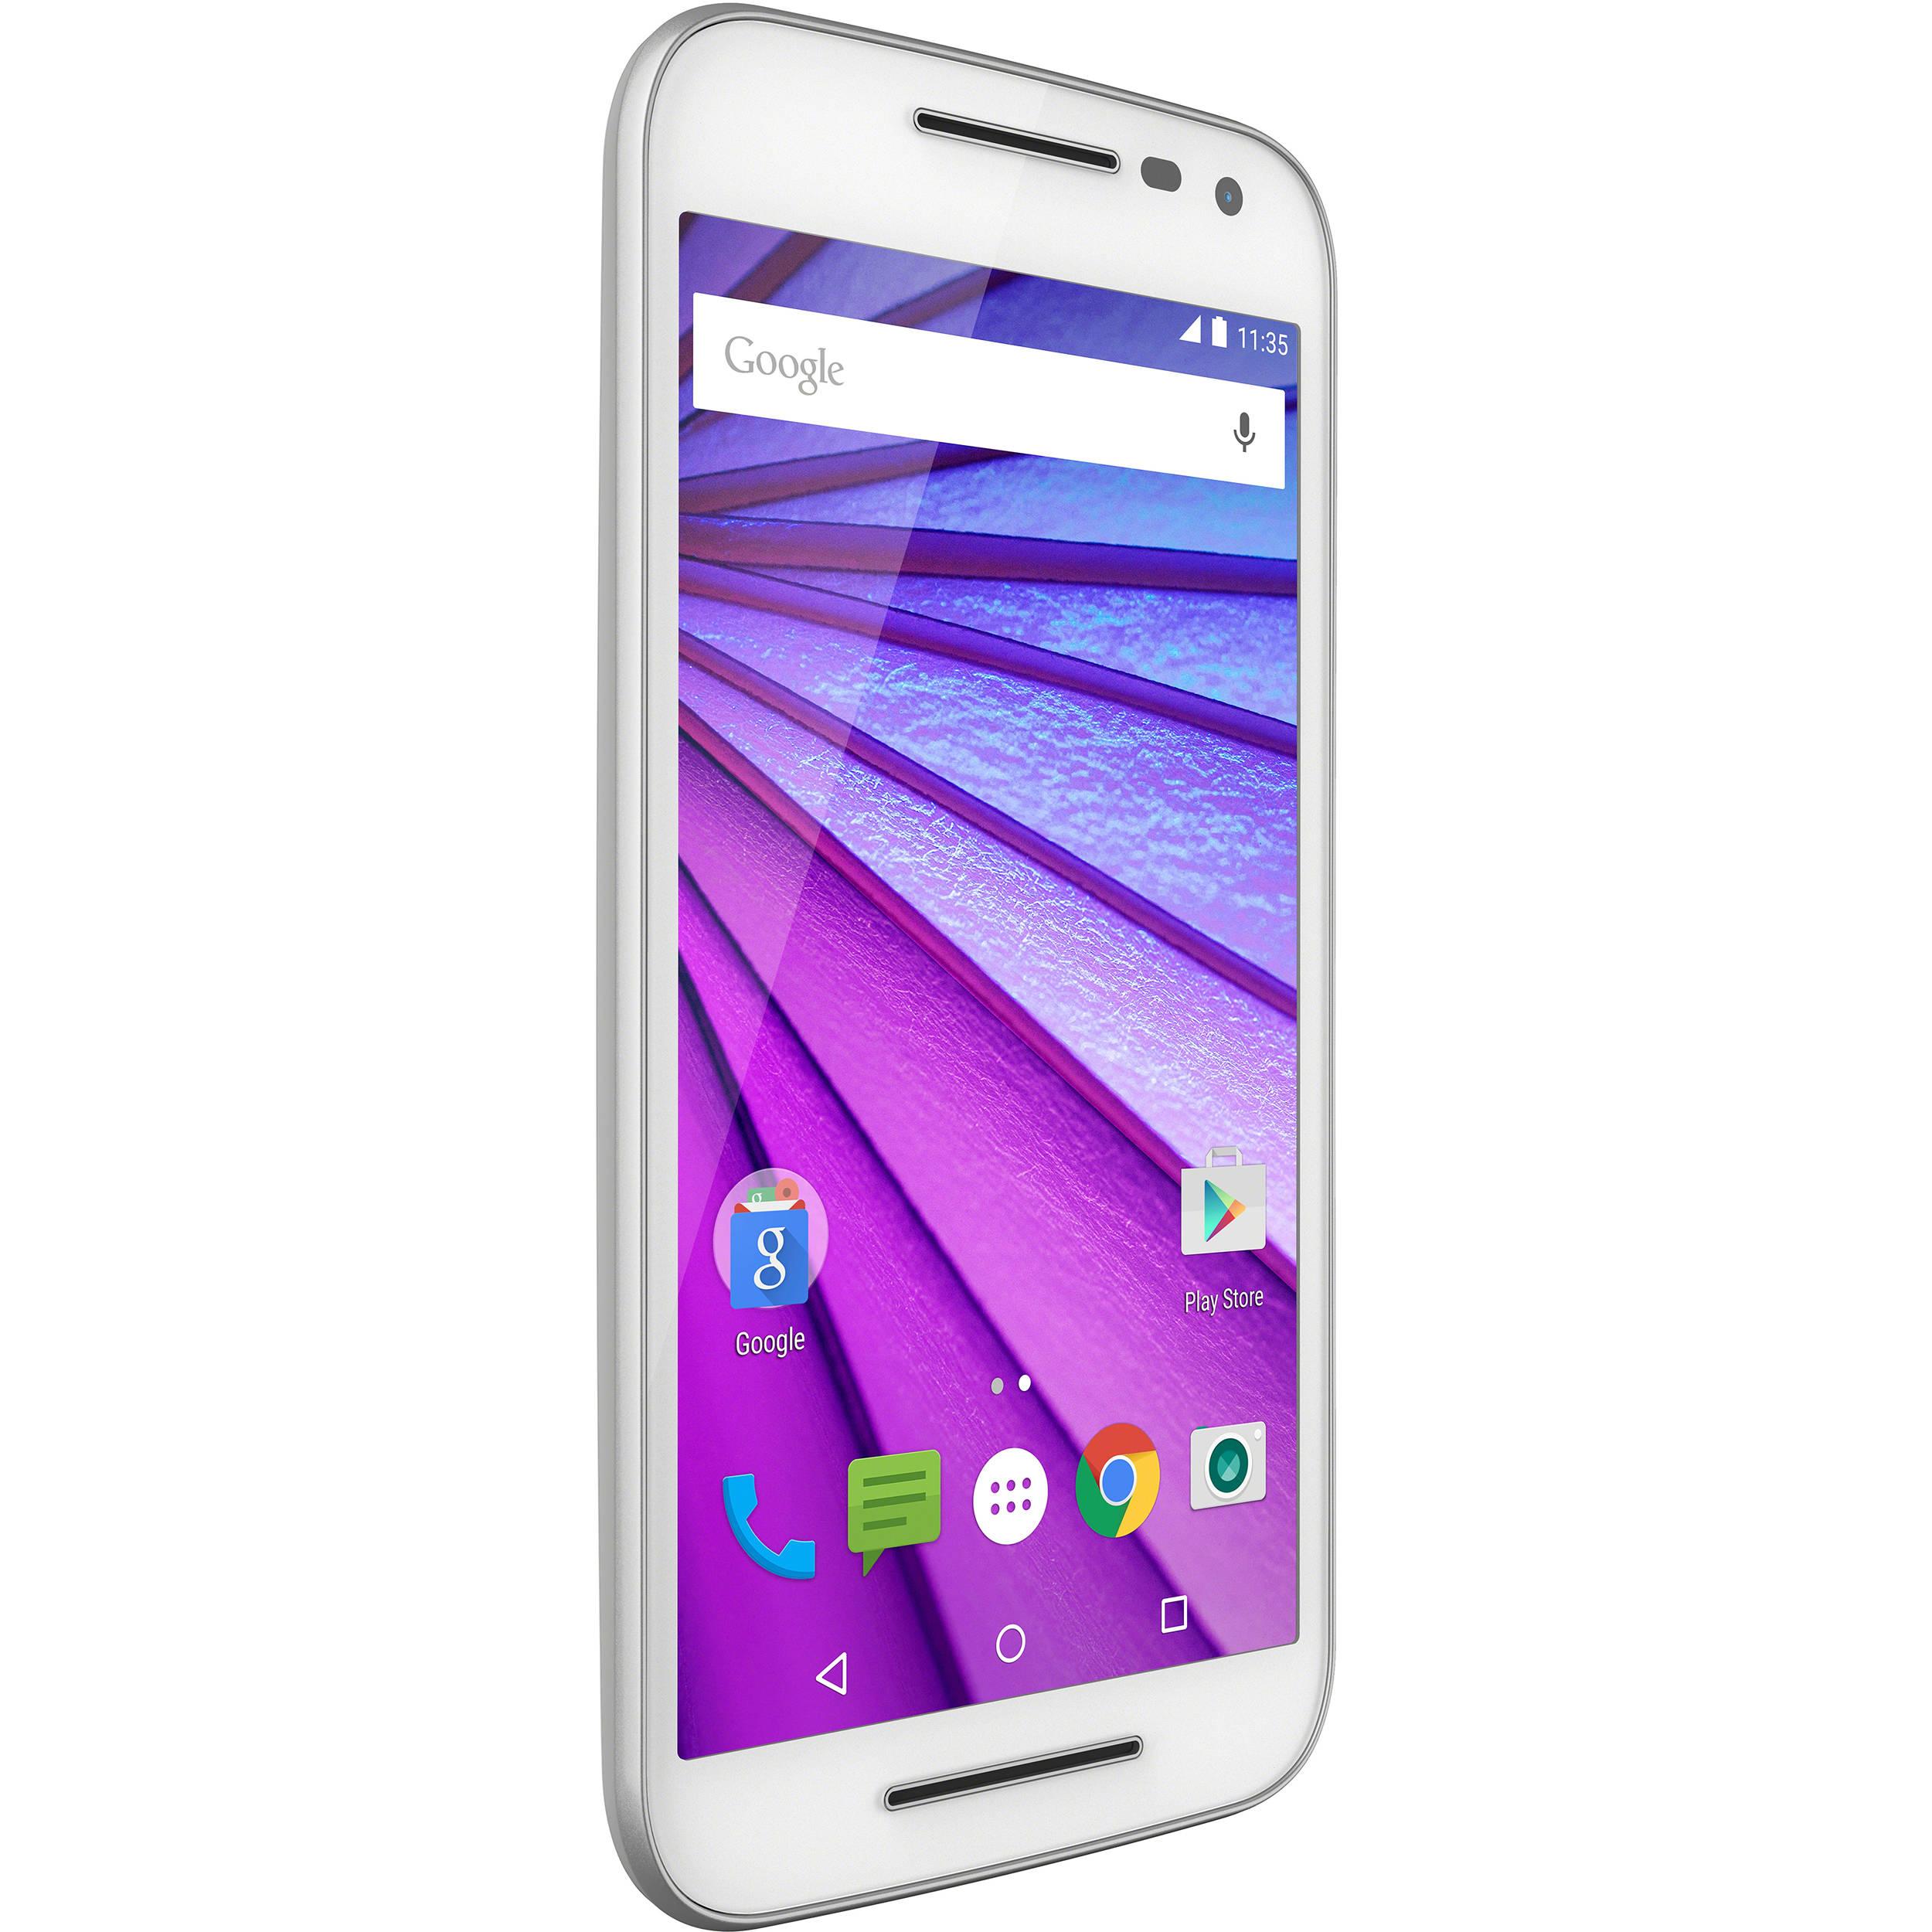 a62290c549e Motorola Moto G 8GB XT1540 Smartphone 3rd Gen (Unlocked, White)